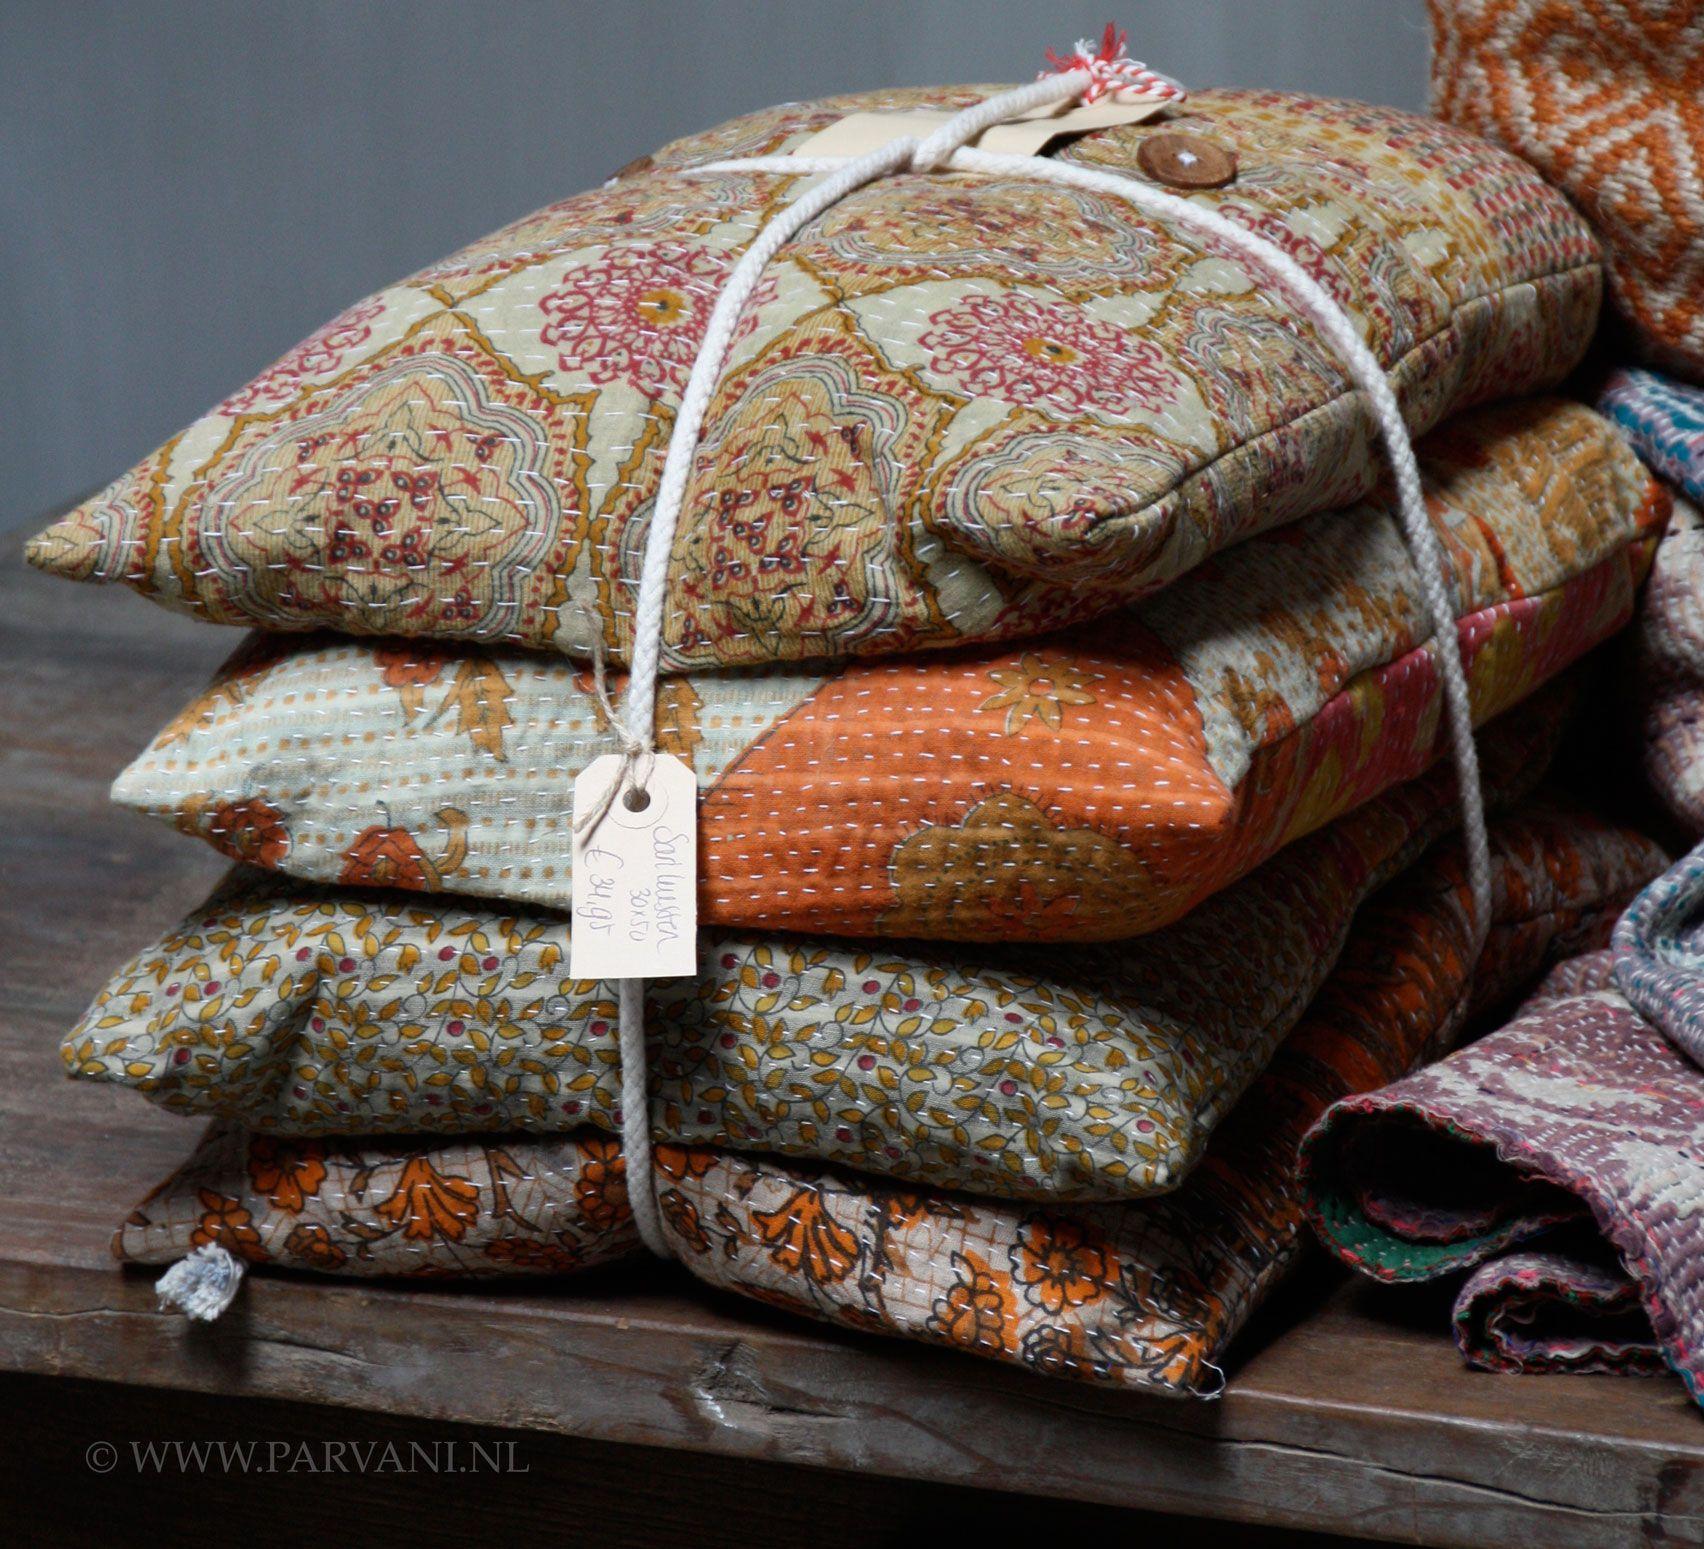 Parvani | Kussens-oude-sari-patroon-motief